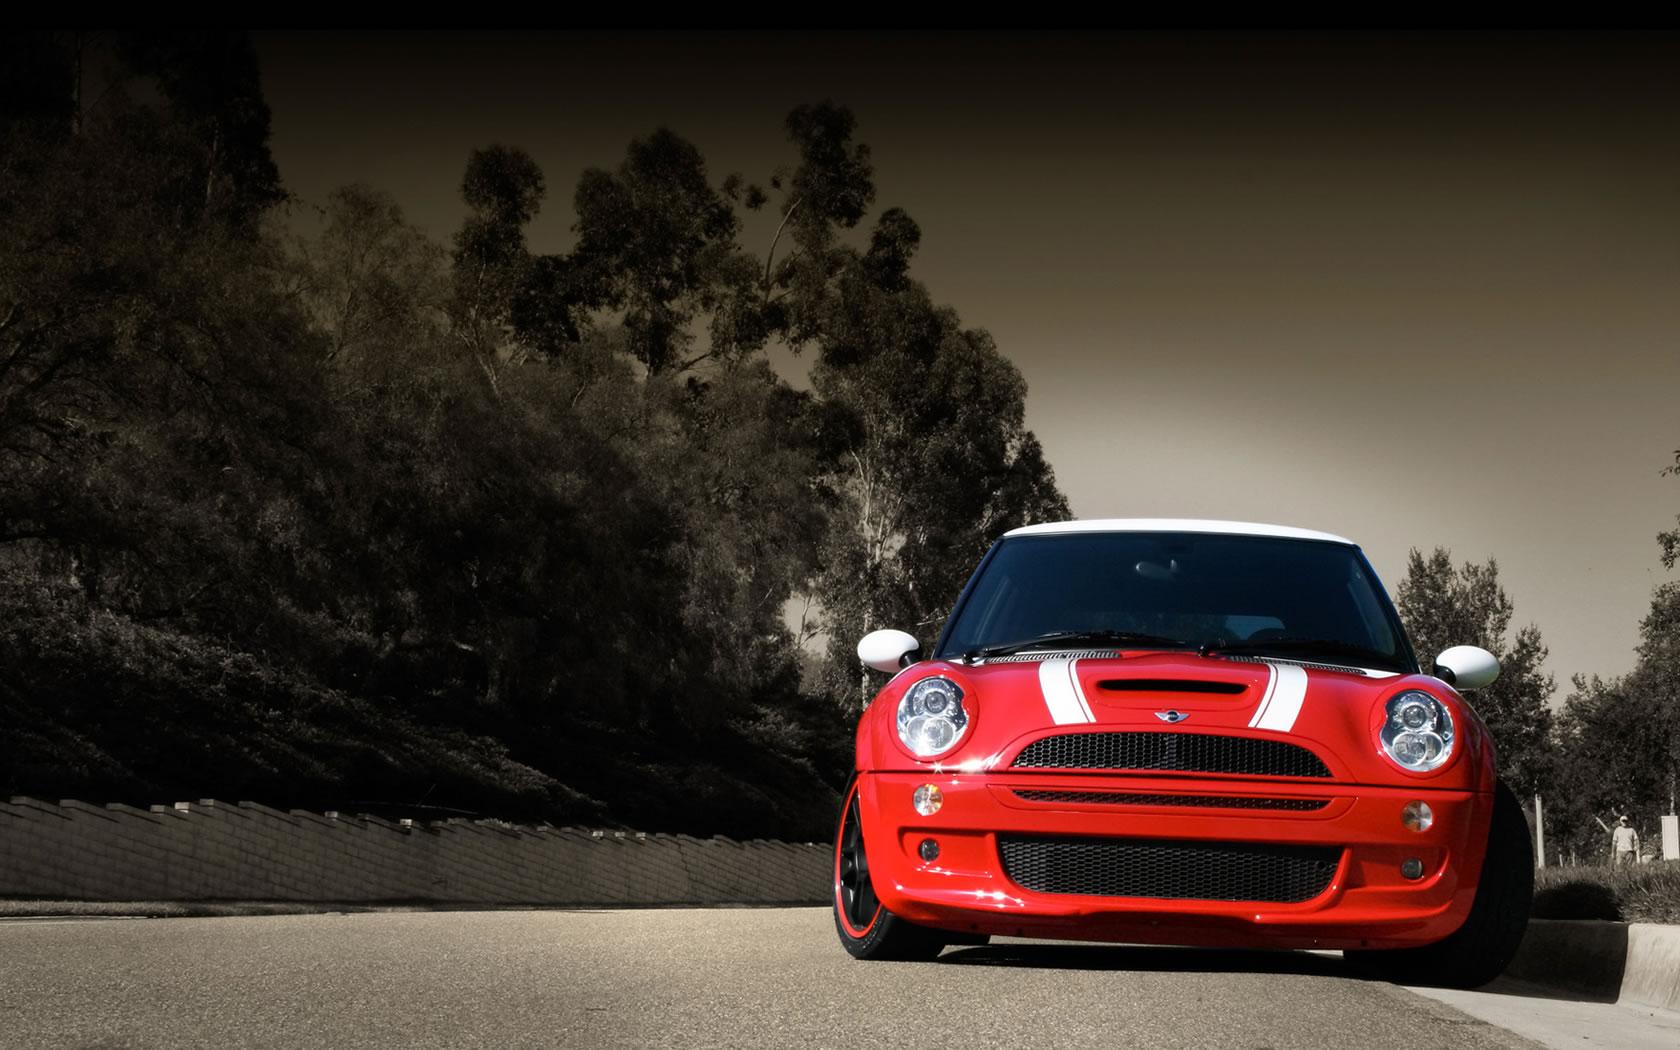 Red Mini Cooper - Red Mini Cooper